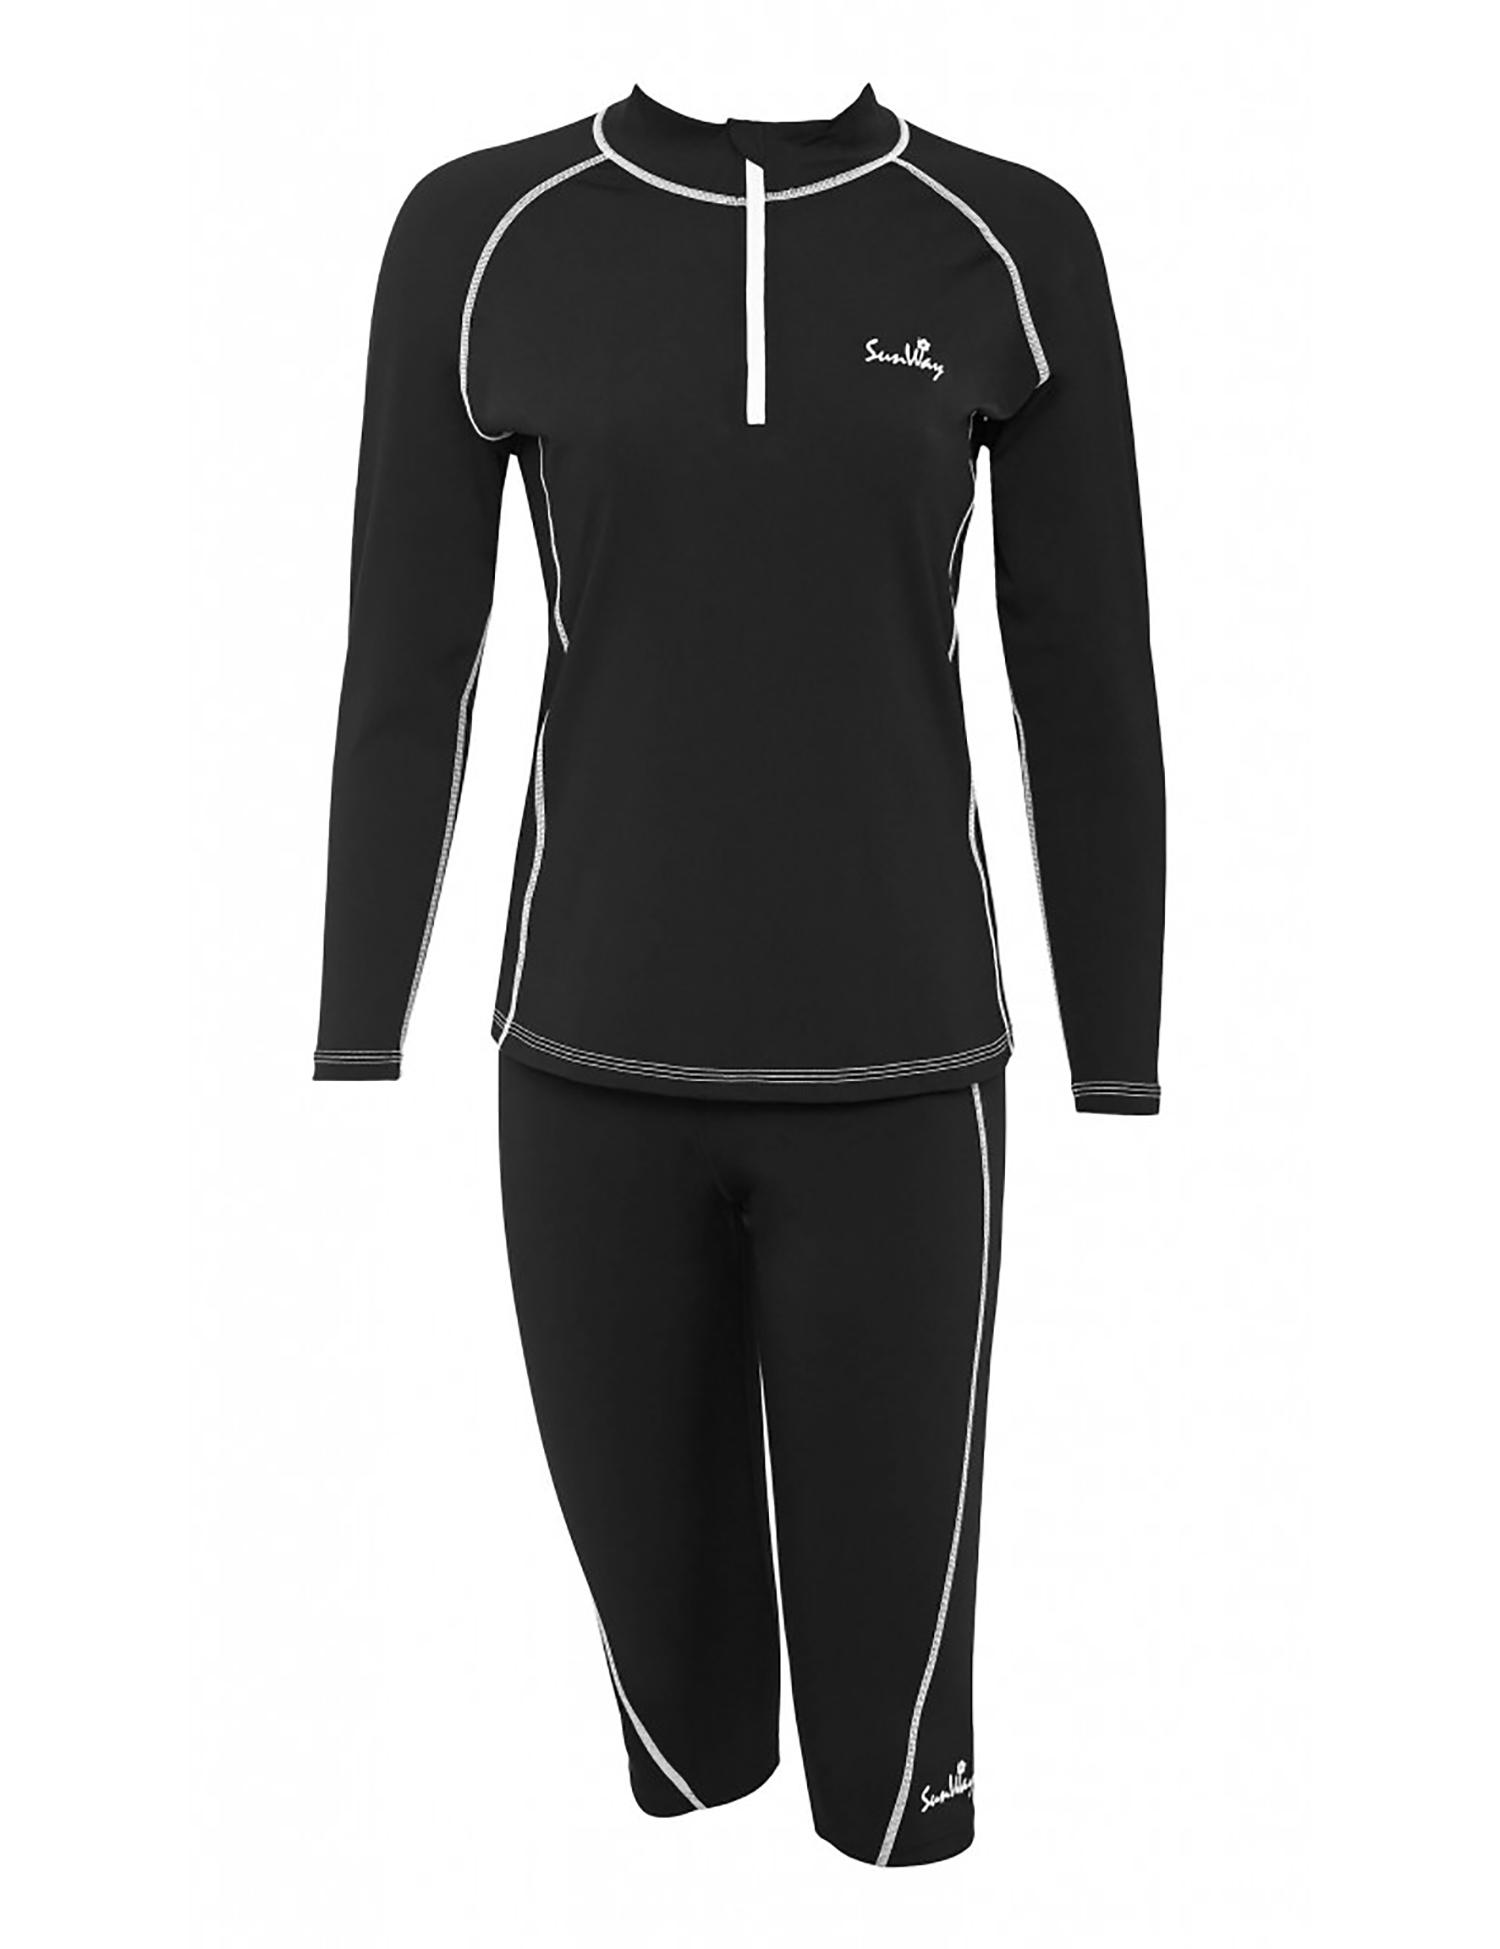 Women's Long Sleeves UV Watersport Shirts